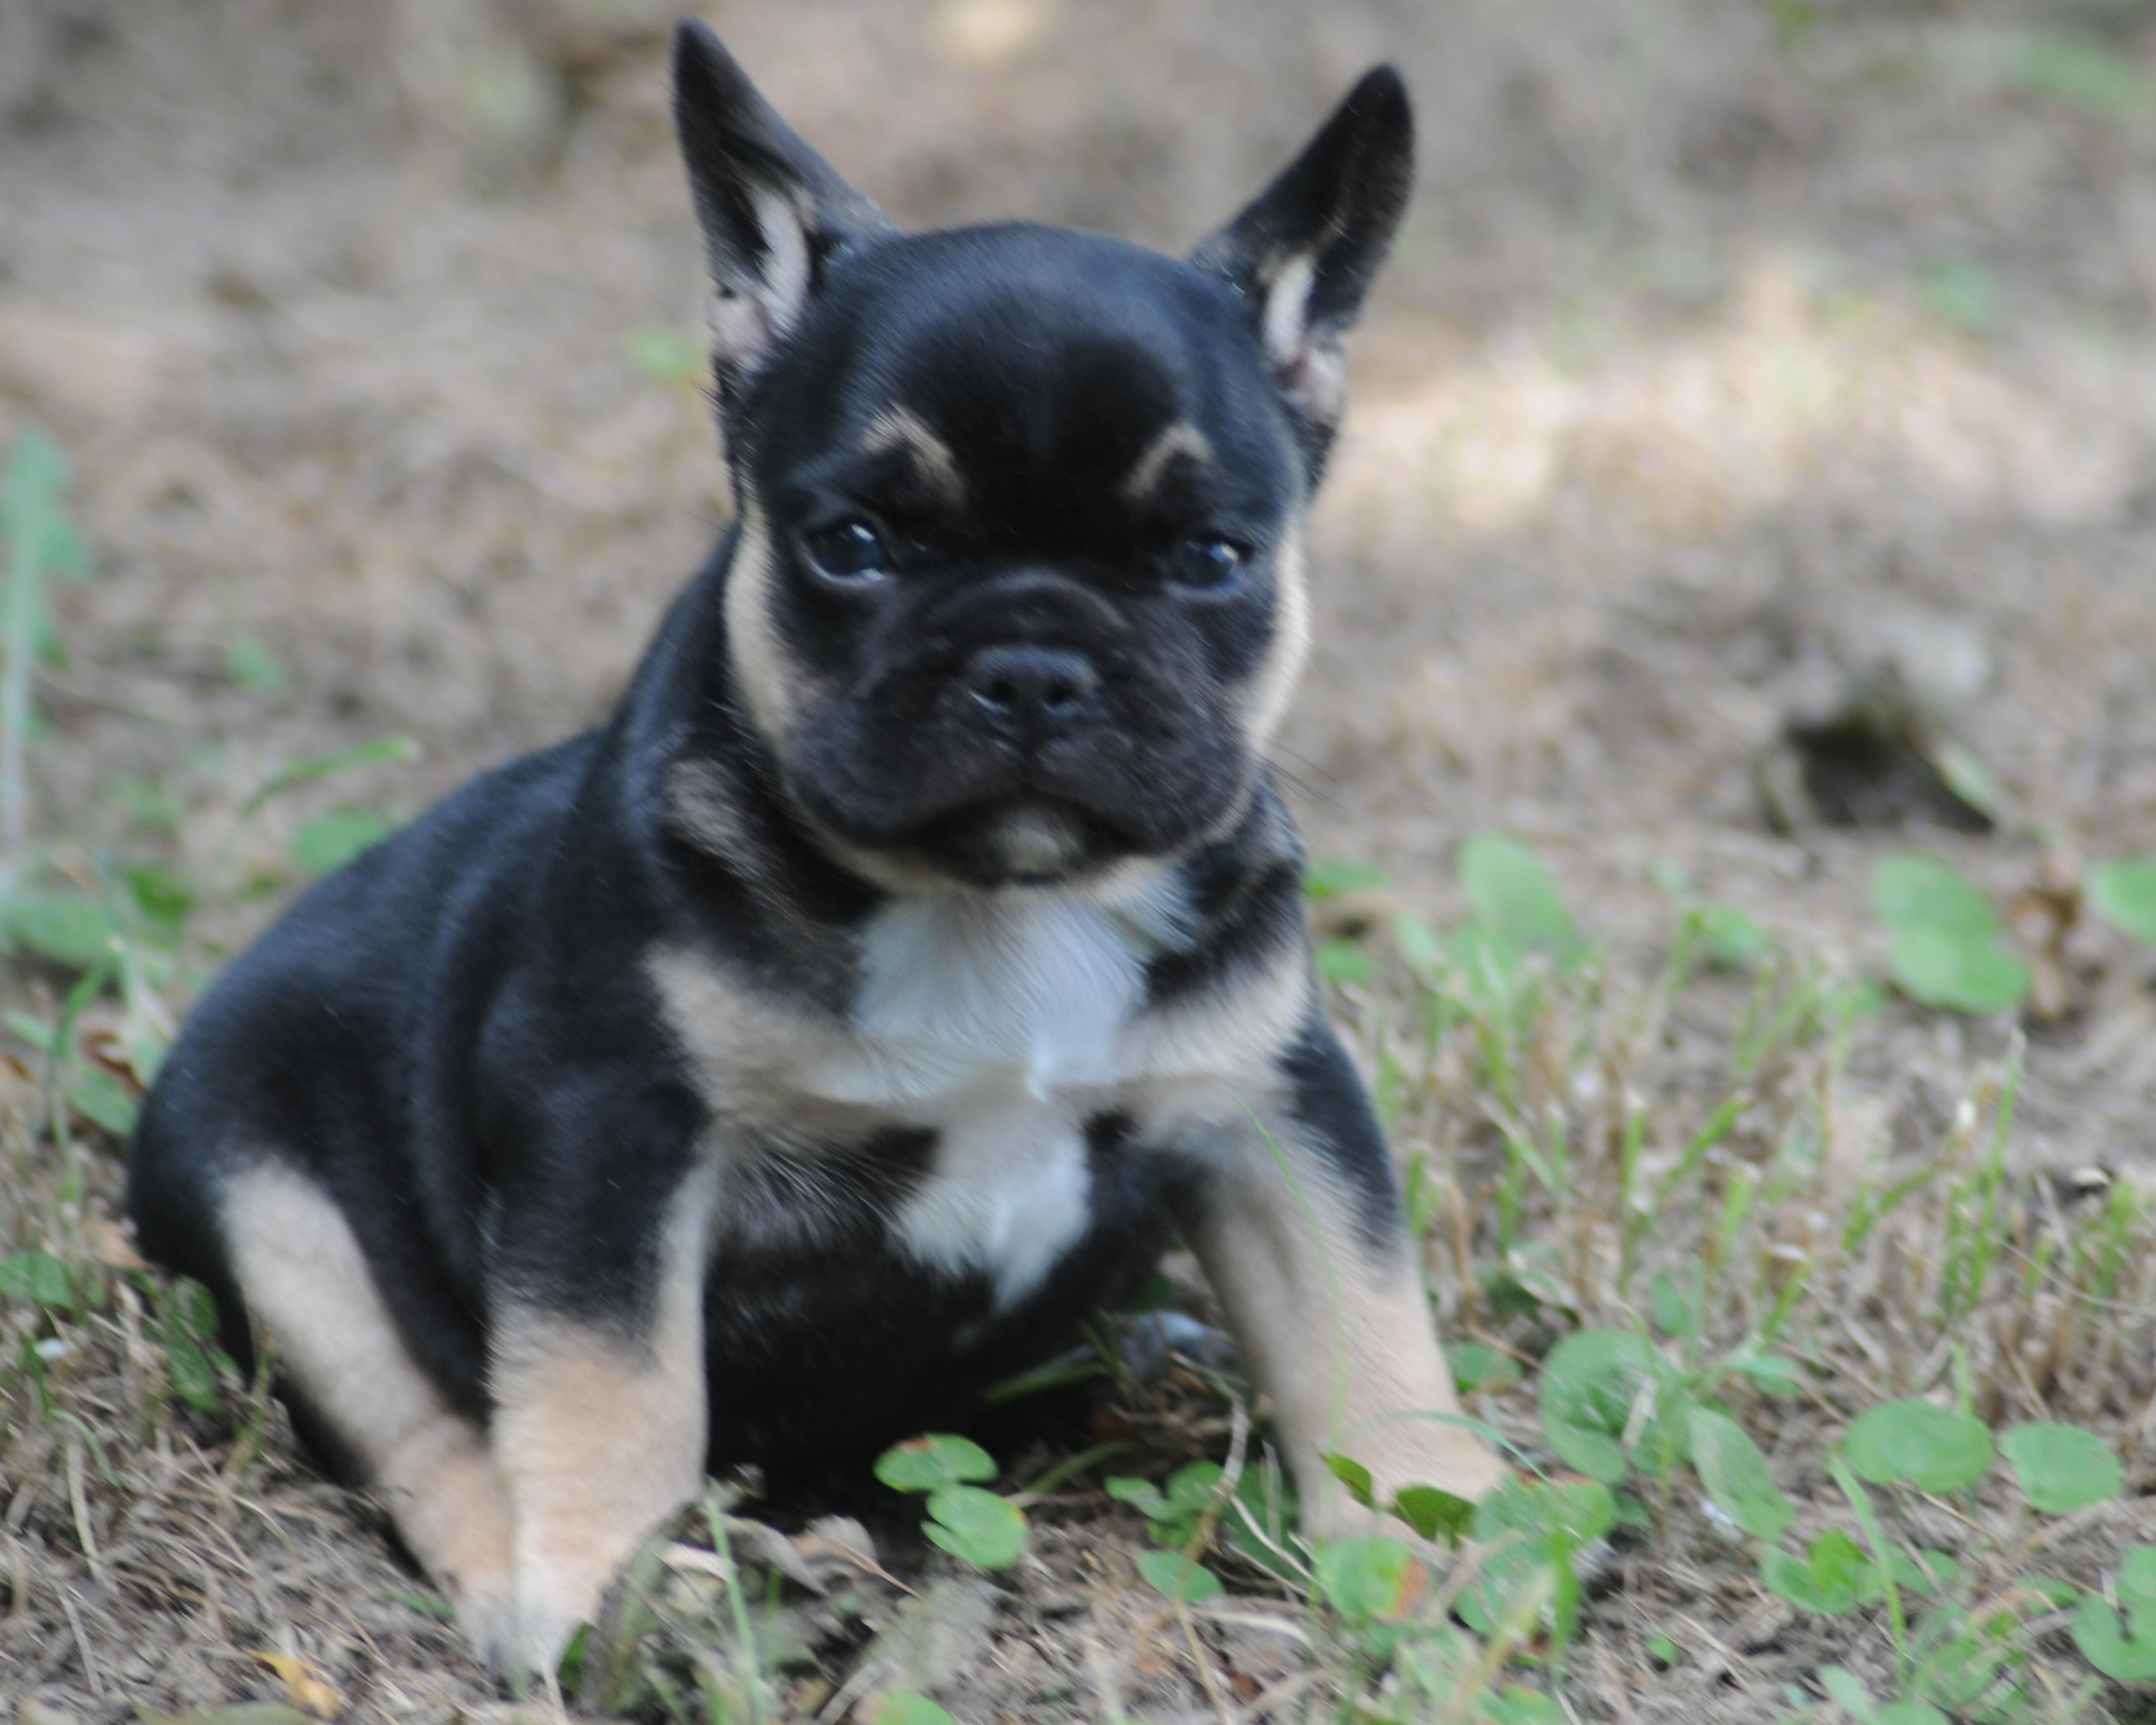 Black & Tan French Bulldogs – Blue French Bulldogs by Bullistik